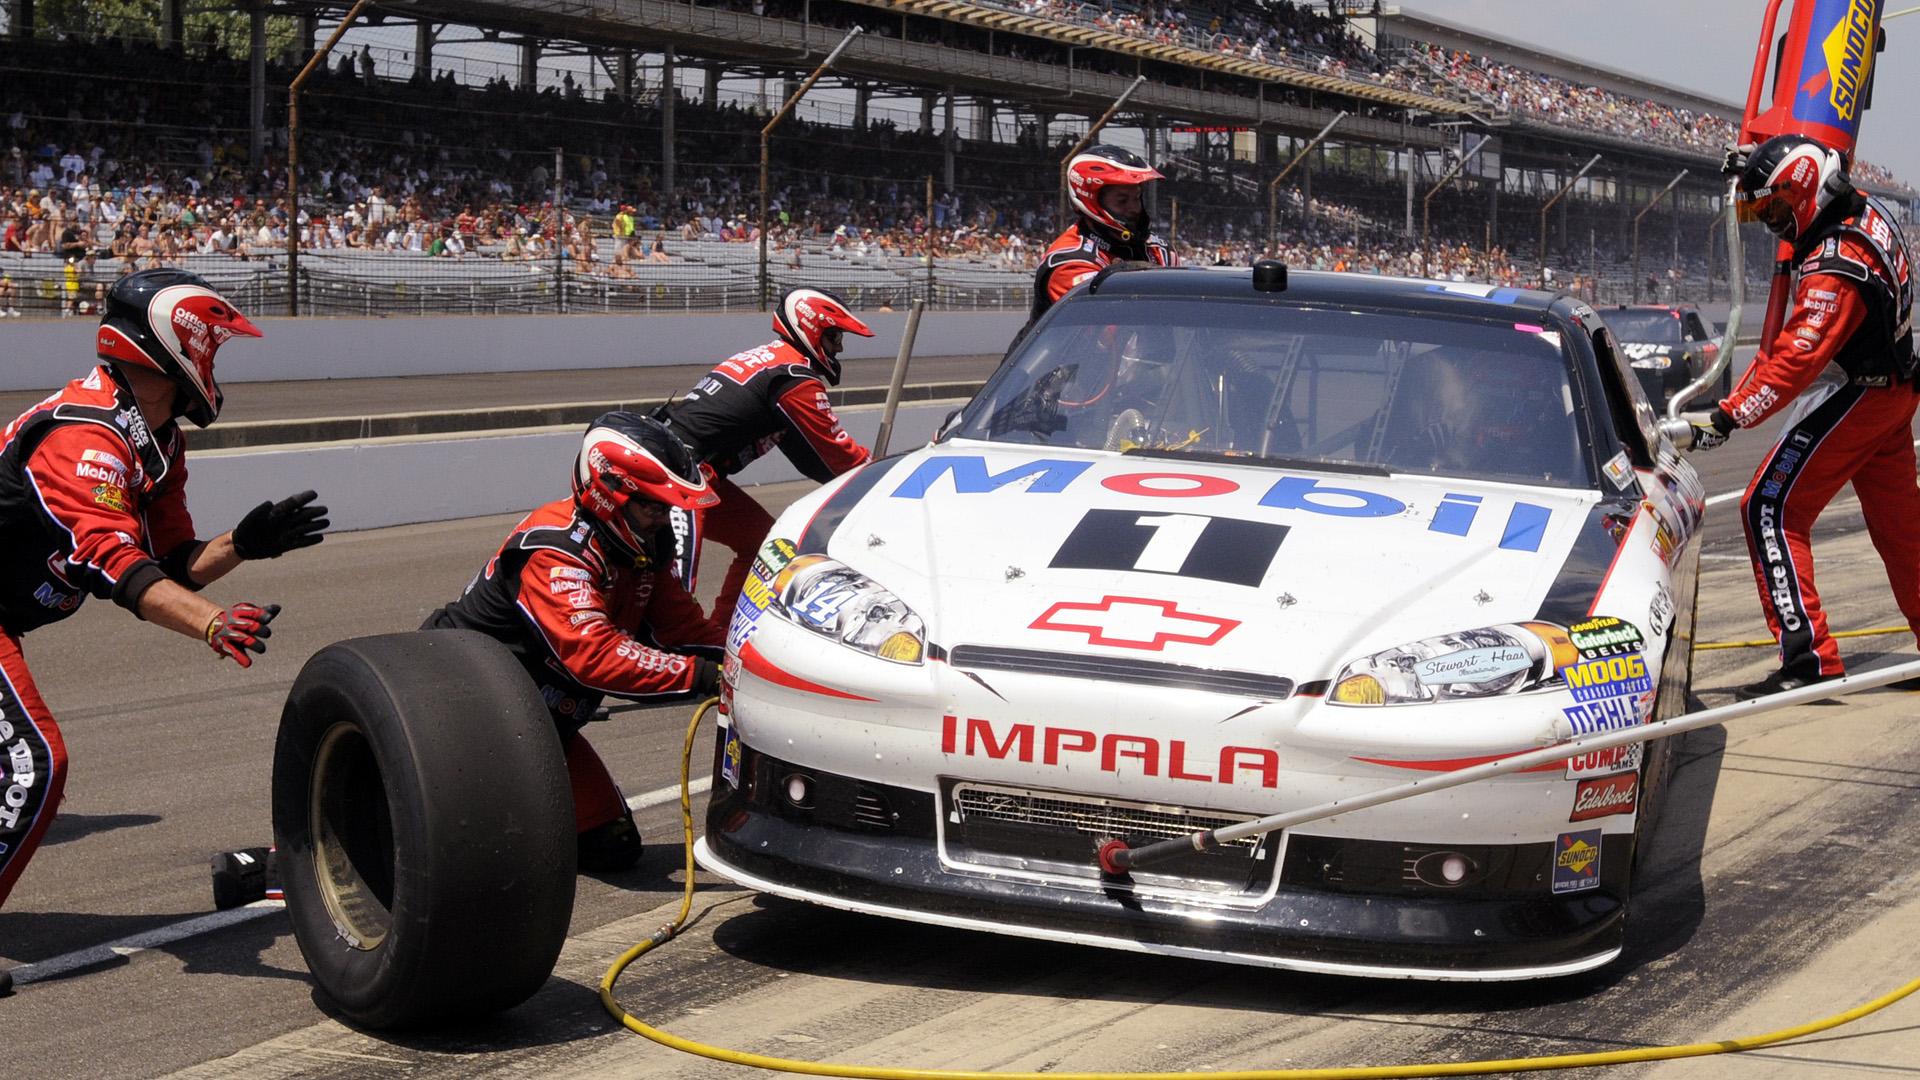 Tony Stewart-Indy-062014-AP-FTR.jpg